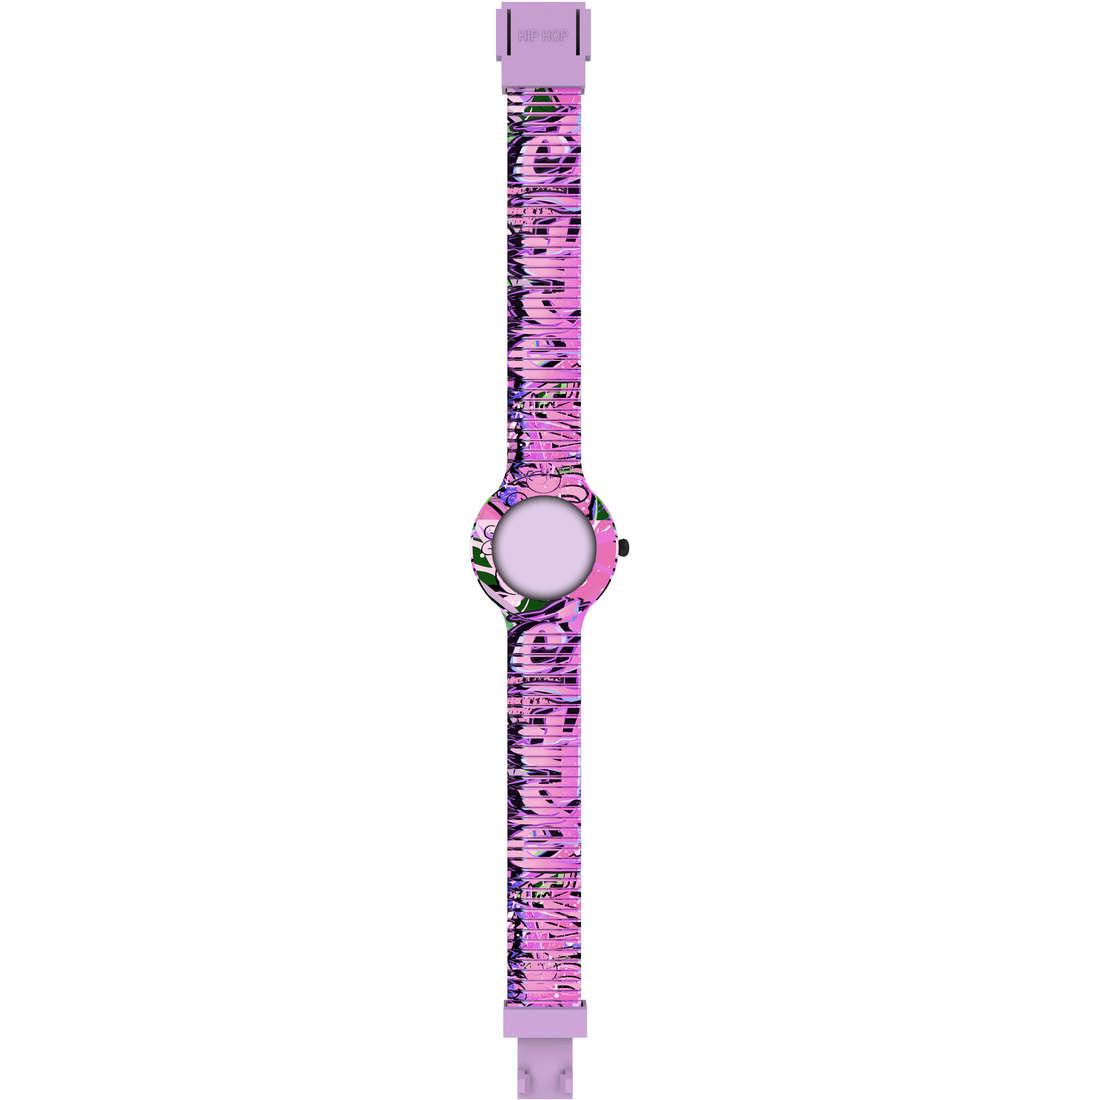 watch accessory woman Hip Hop Graffiti HBU0624